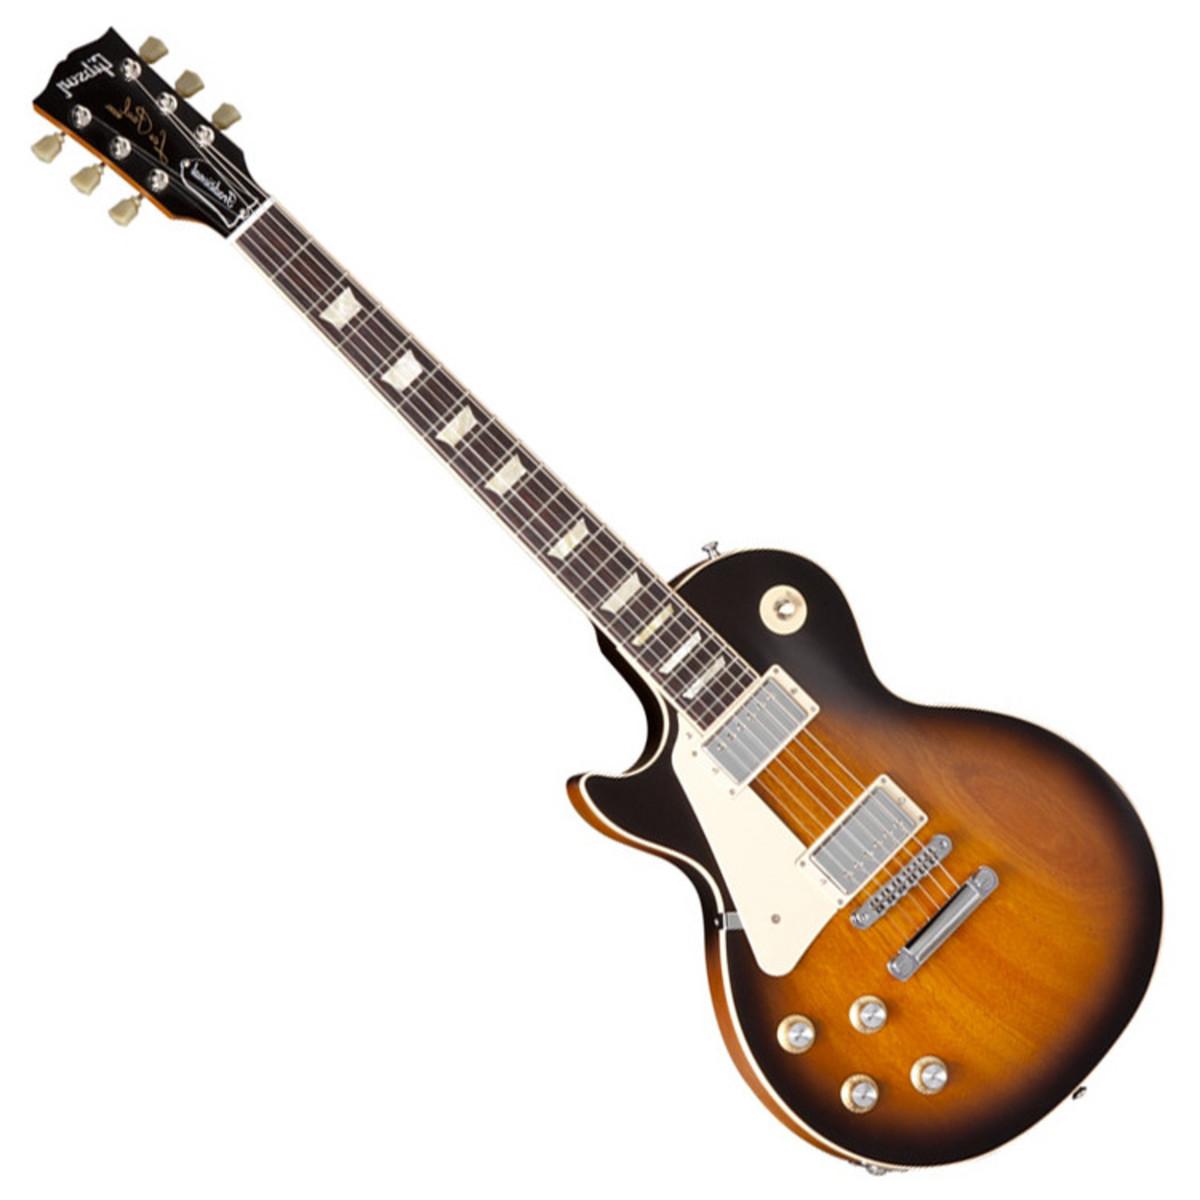 DISC Gibson Les Paul Traditional Left Hand Mahogany Top Vint Sunburst